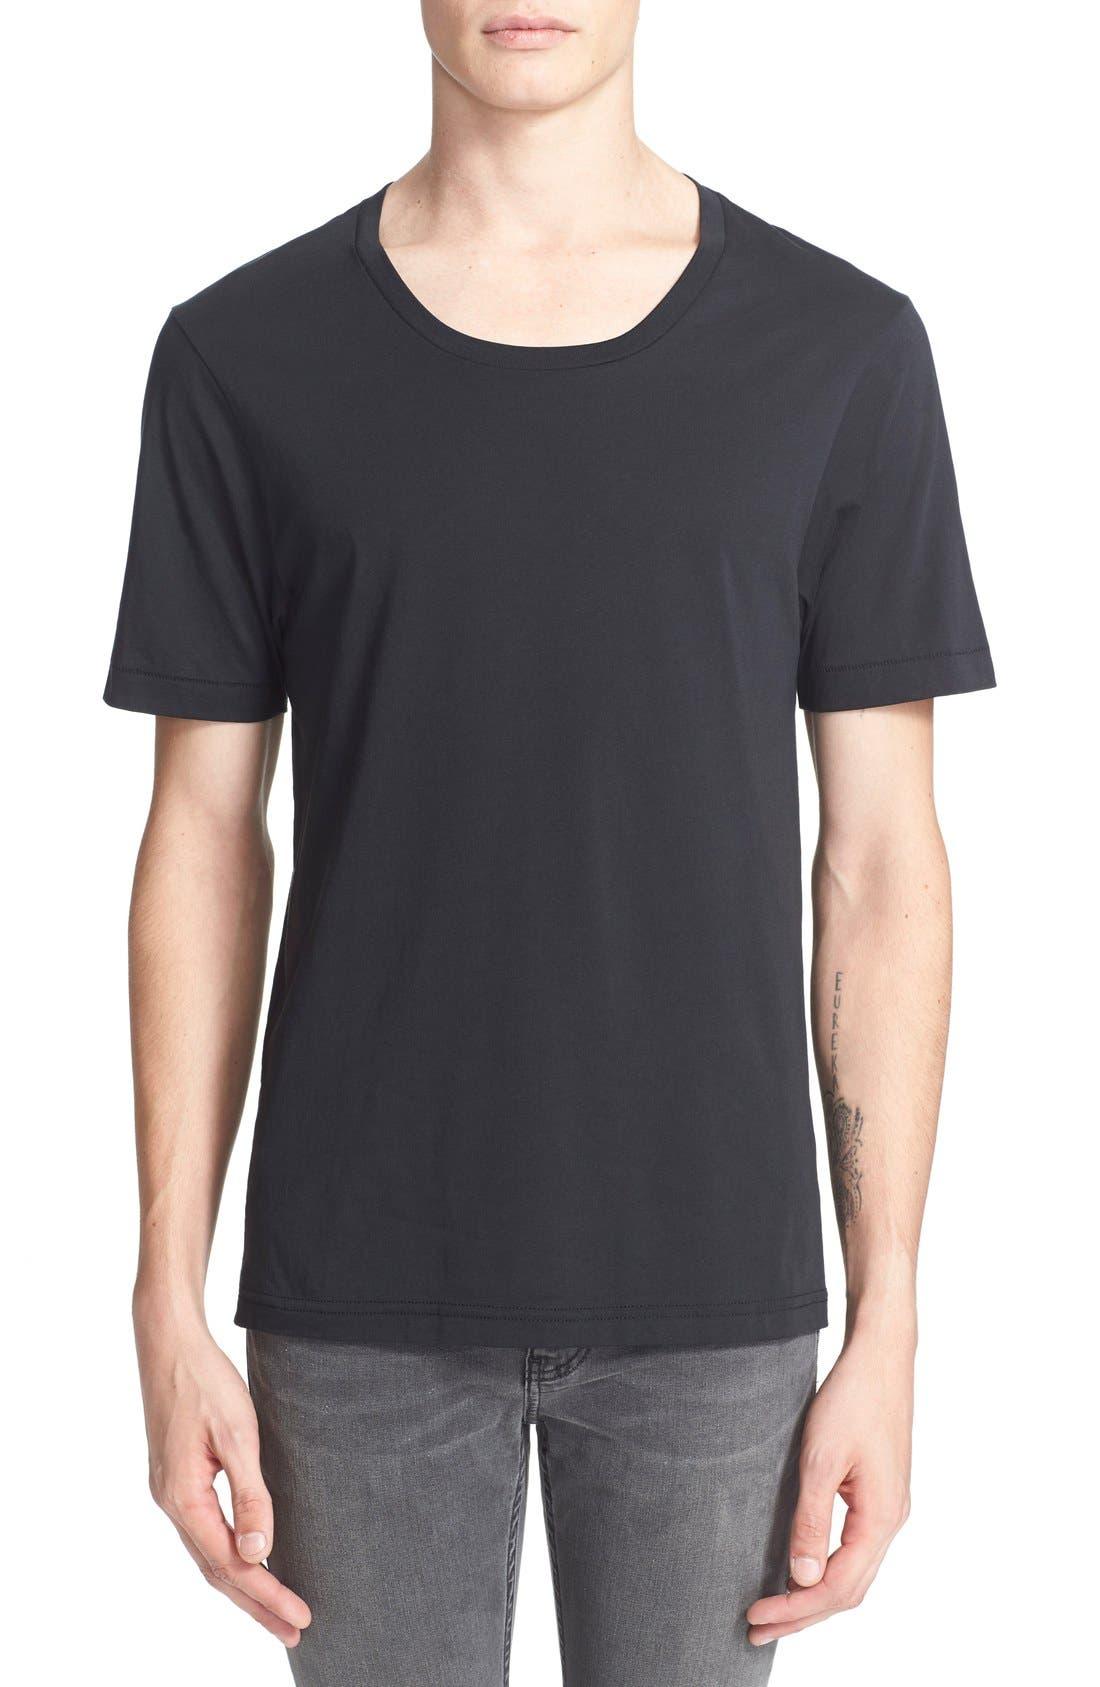 BLK DNM, 'T-Shirt 3' Pima Cotton T-Shirt, Main thumbnail 1, color, 001